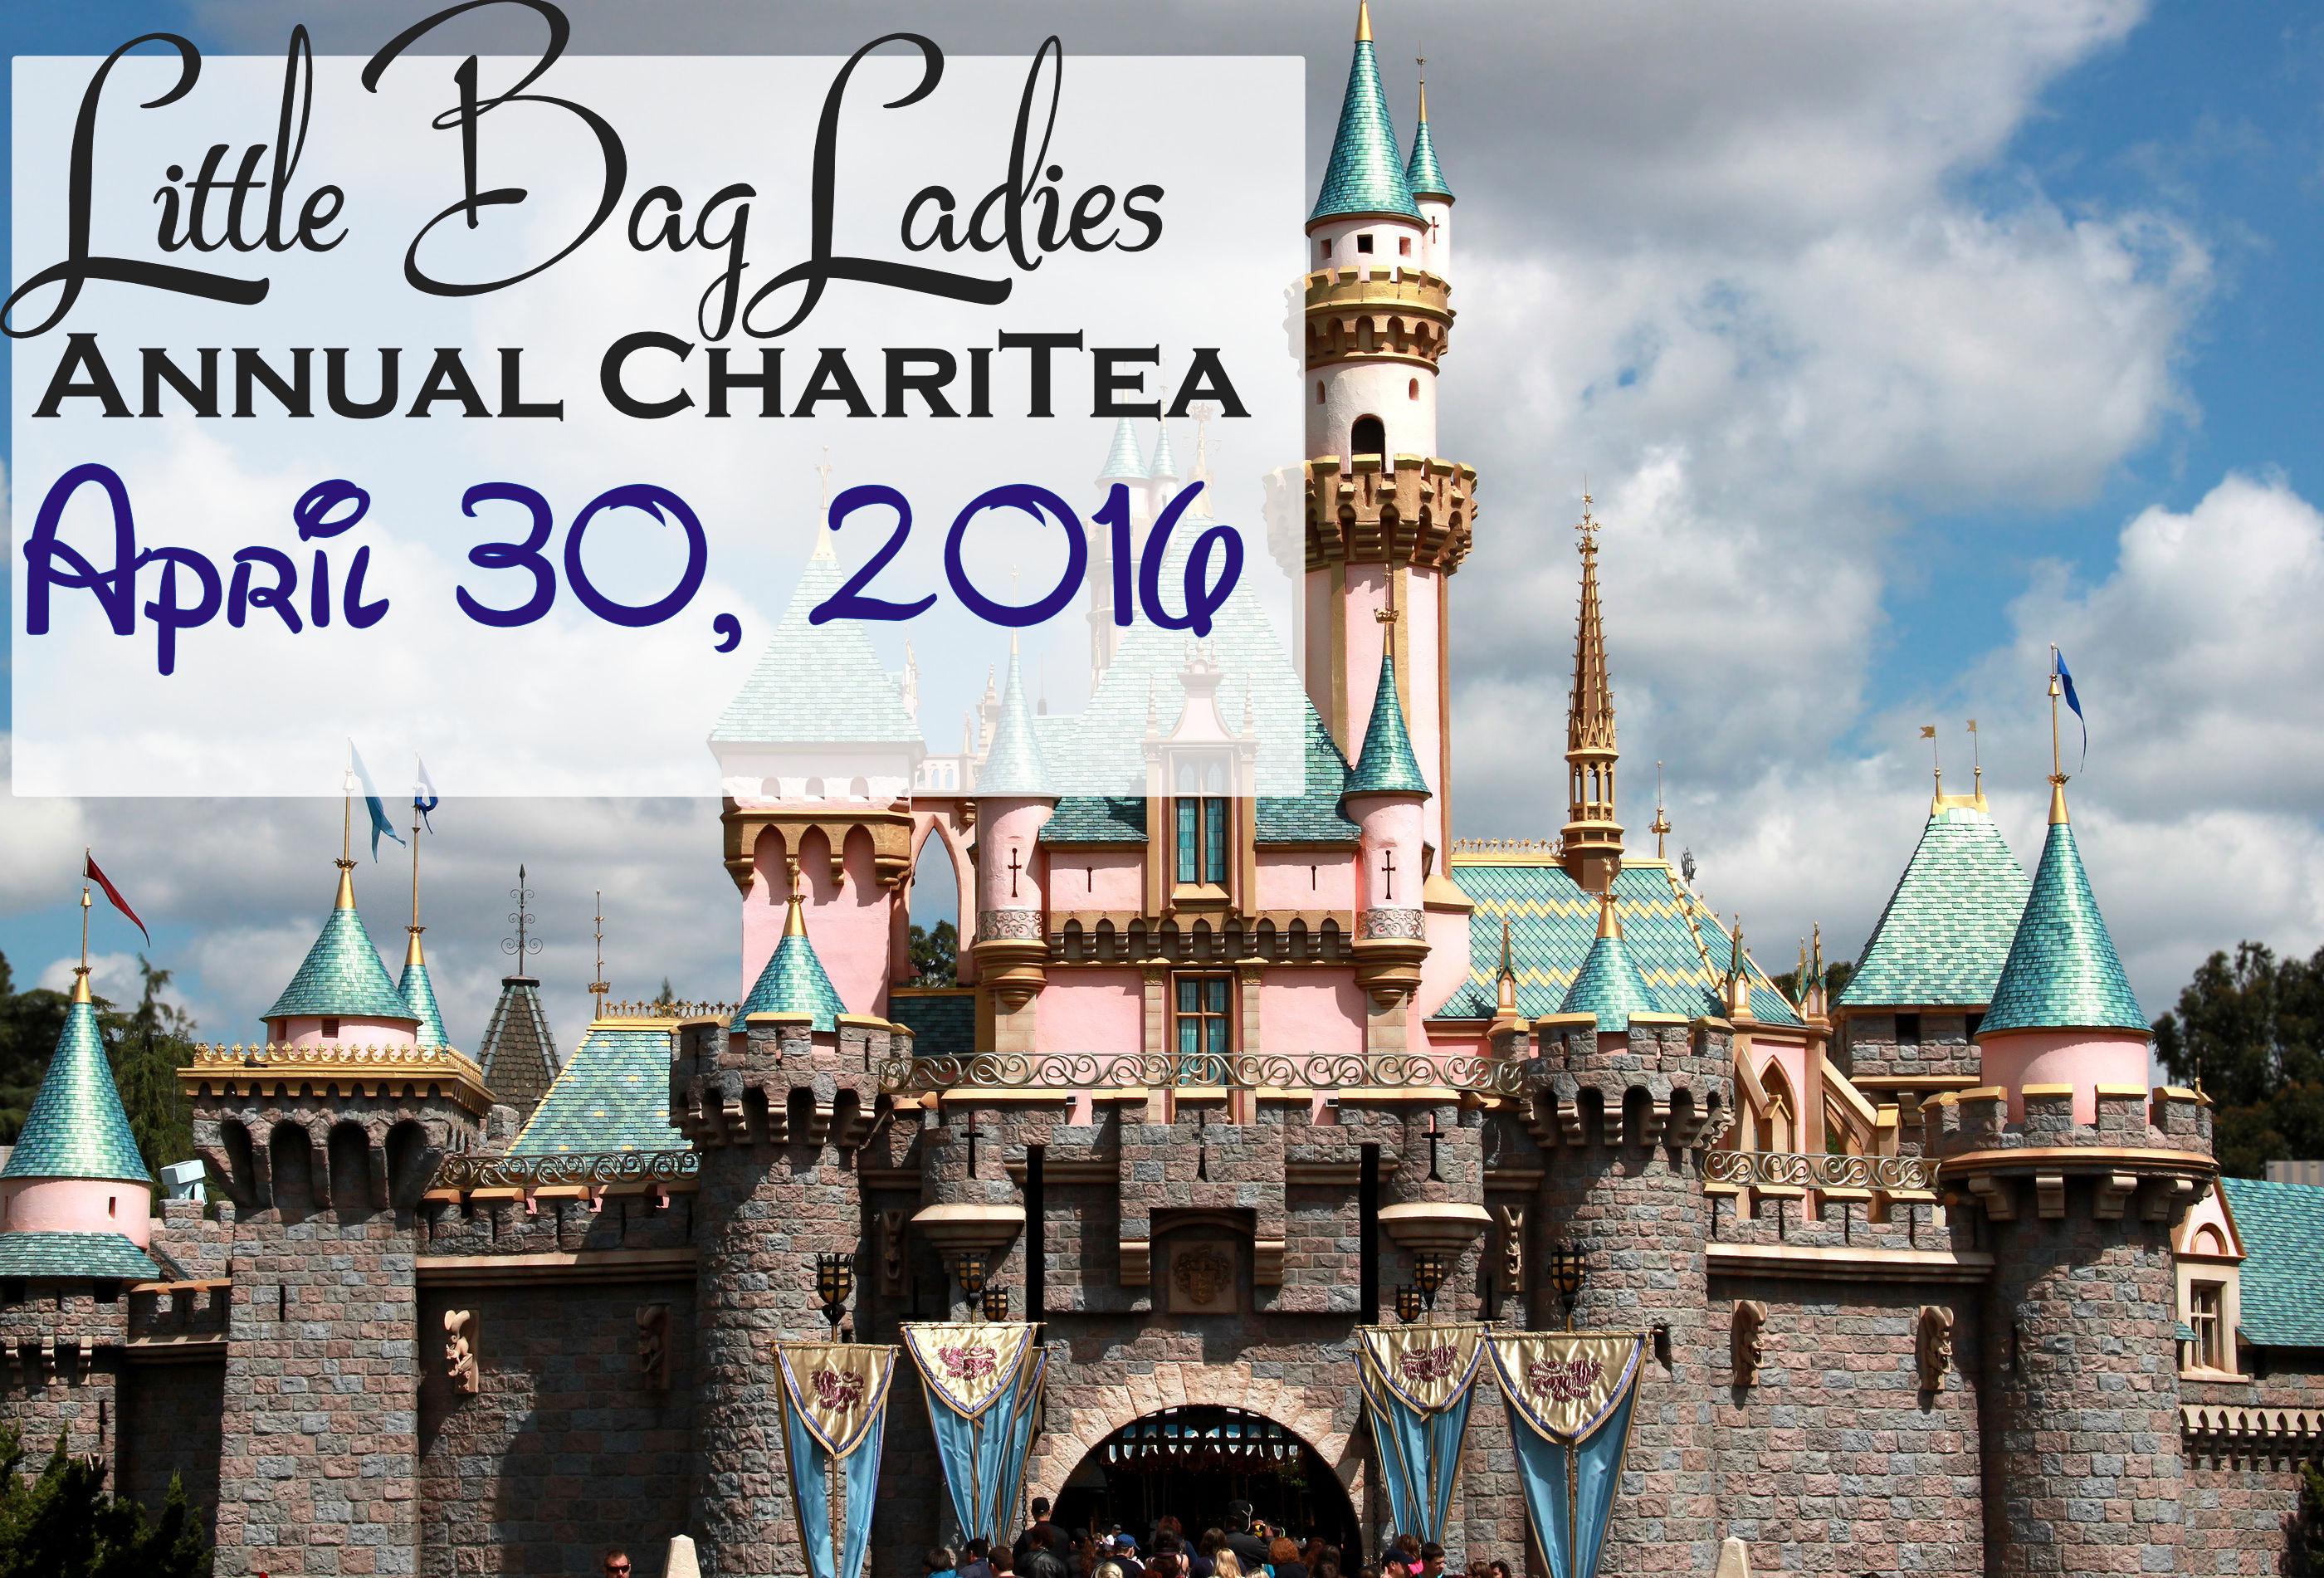 Second Annual ChariTEA event at the Disneyland Hotel Orange Coast